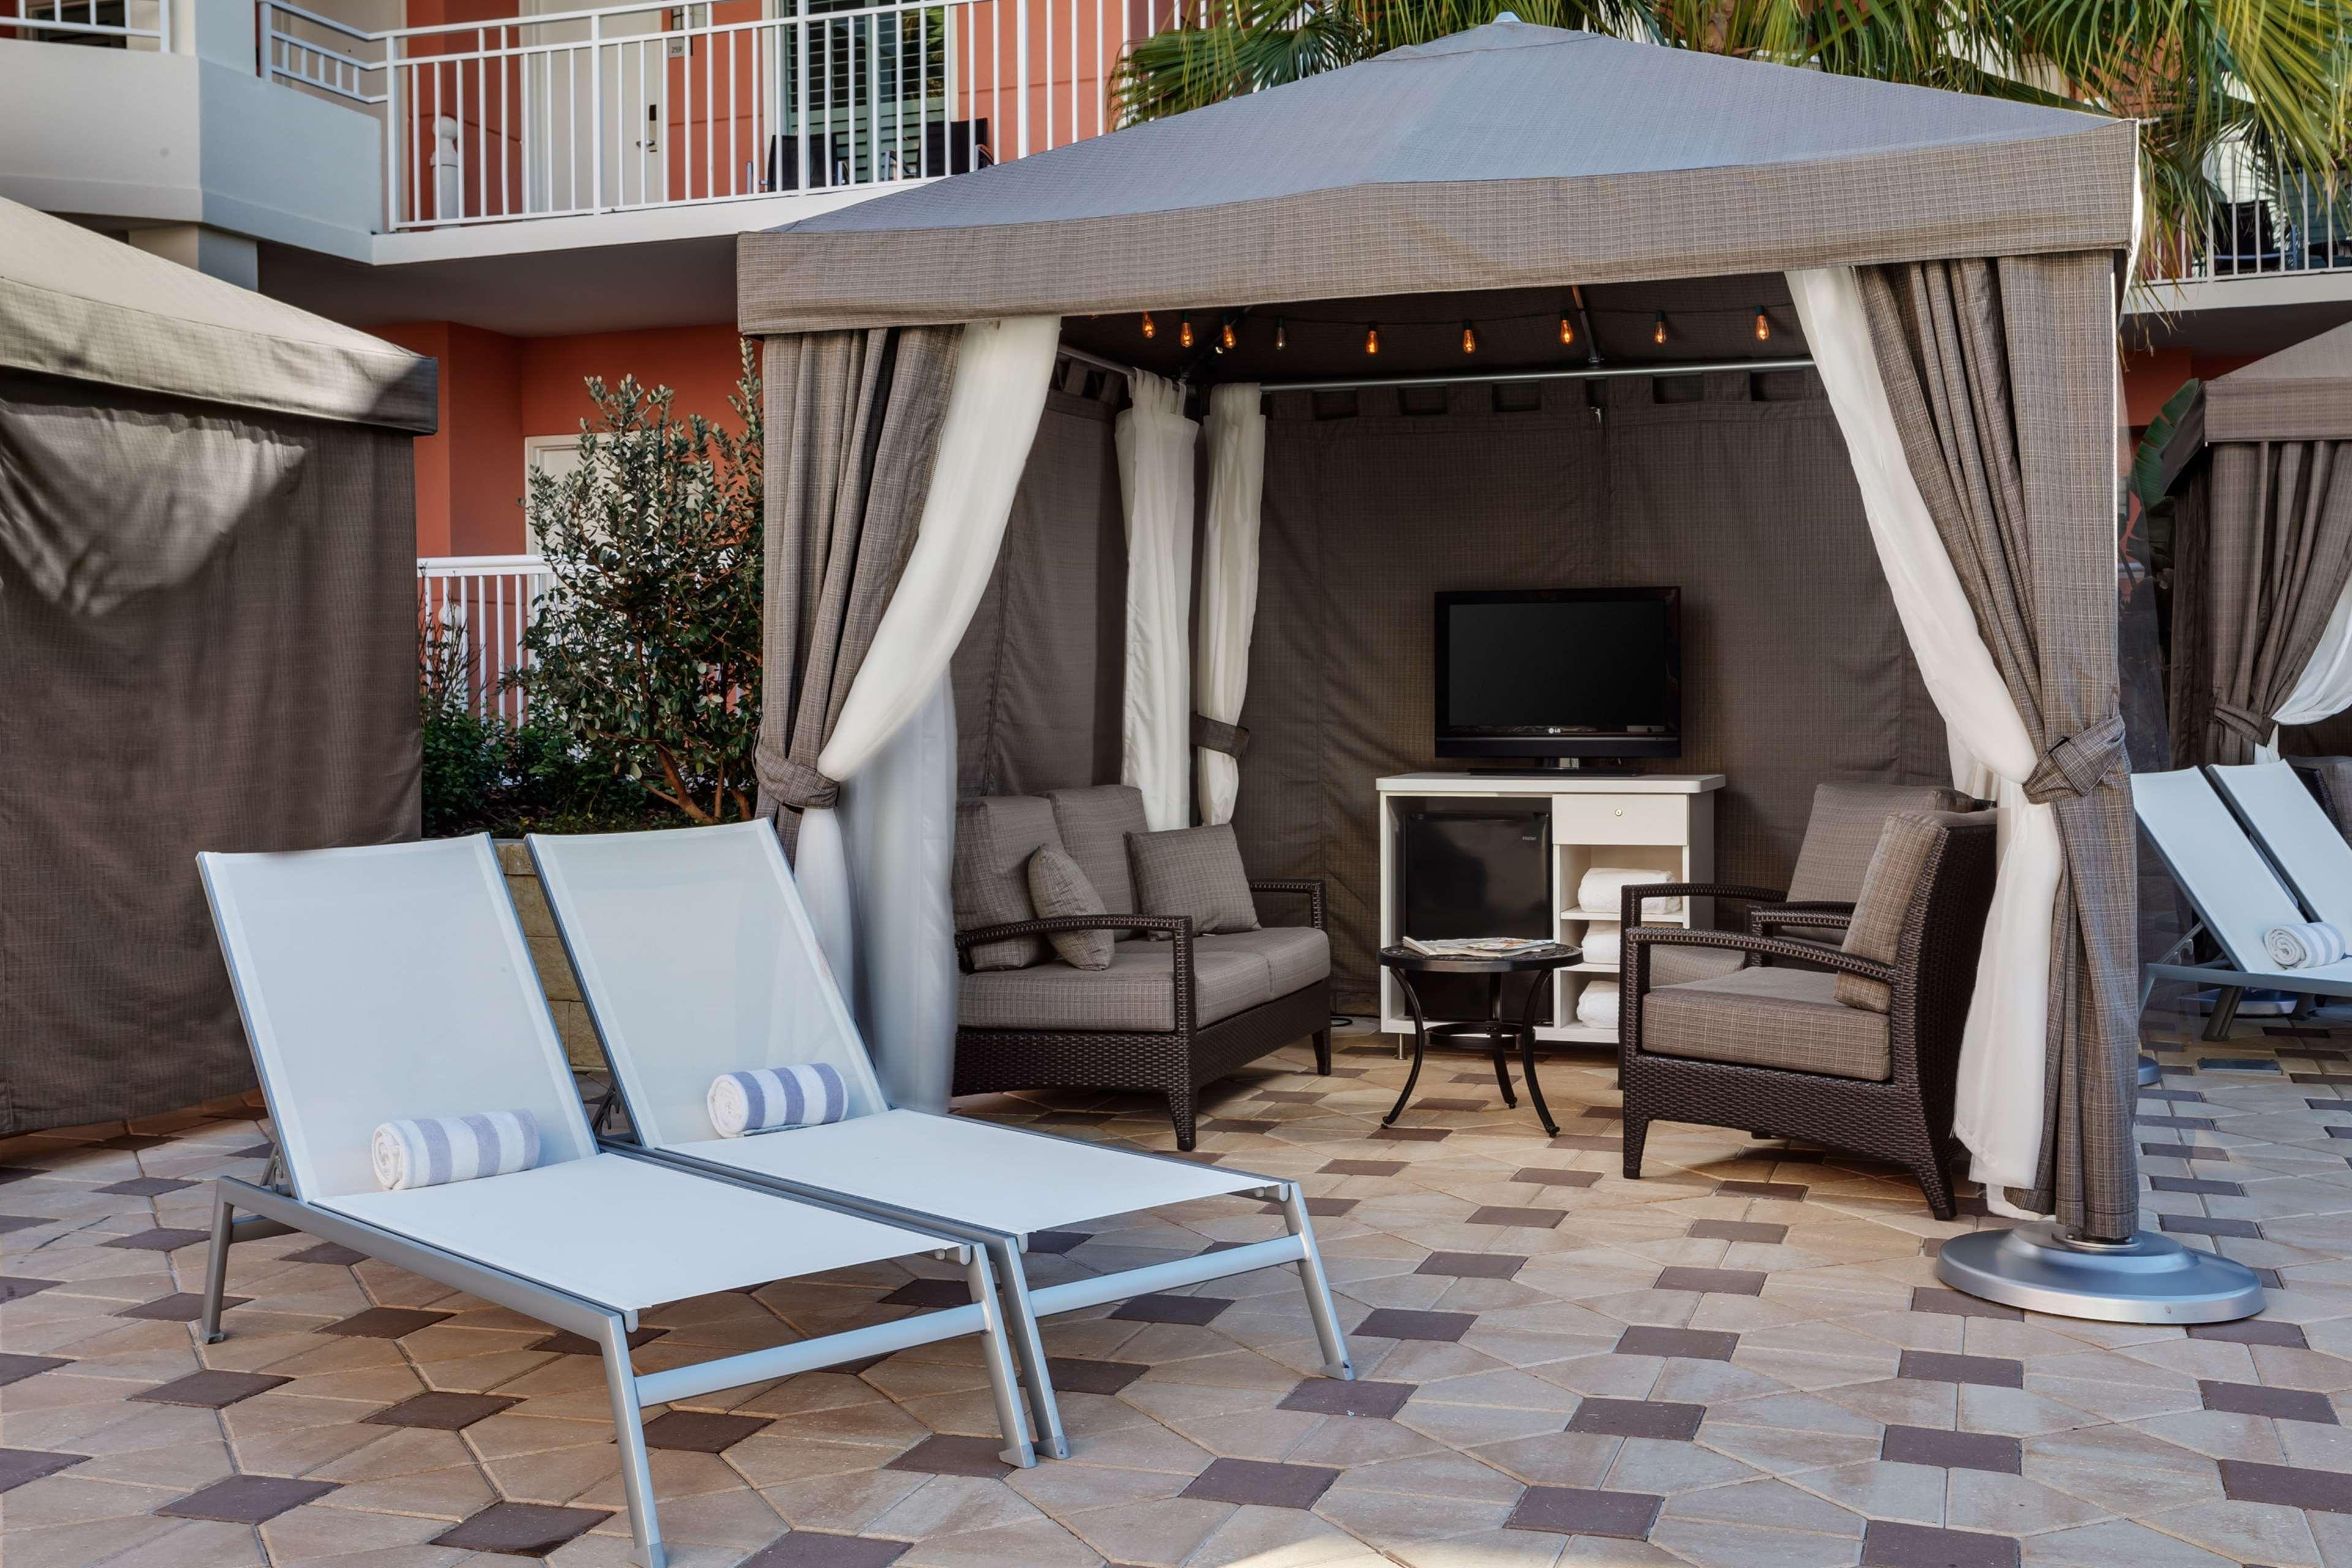 Embassy Suites by Hilton Orlando Lake Buena Vista Resort image 31